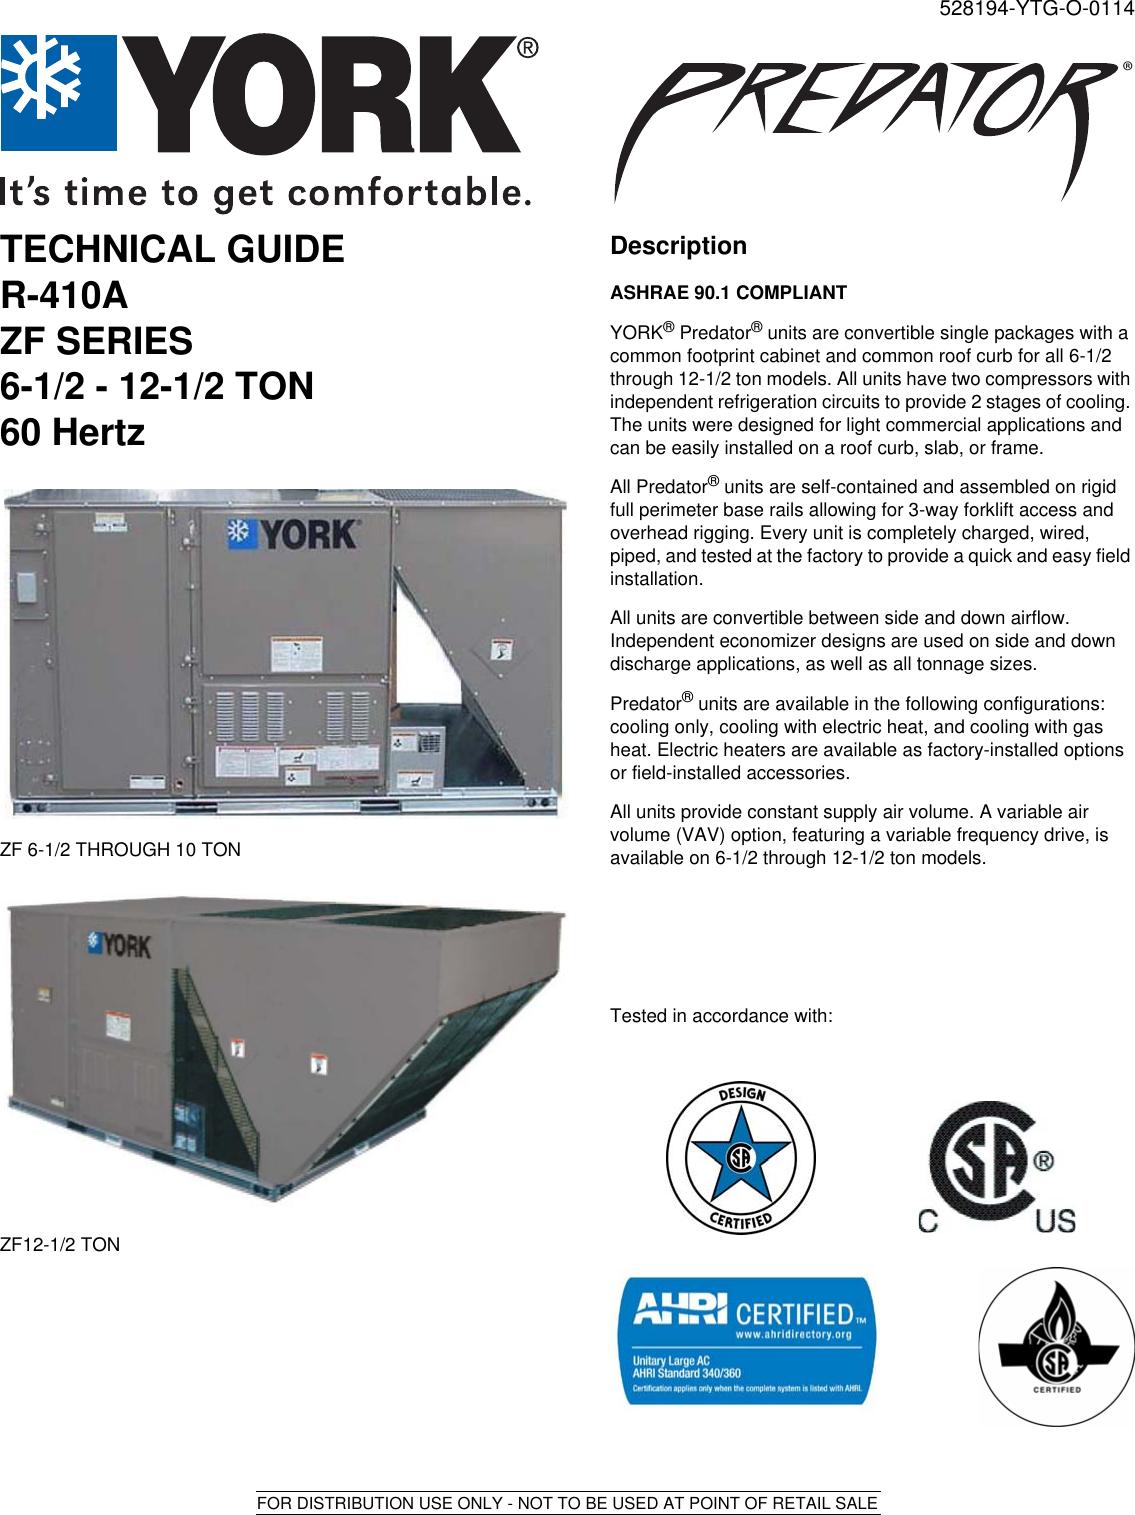 York Zf Predator R410A 11 2 Eer Technical Guide 528194 YTG O 0114